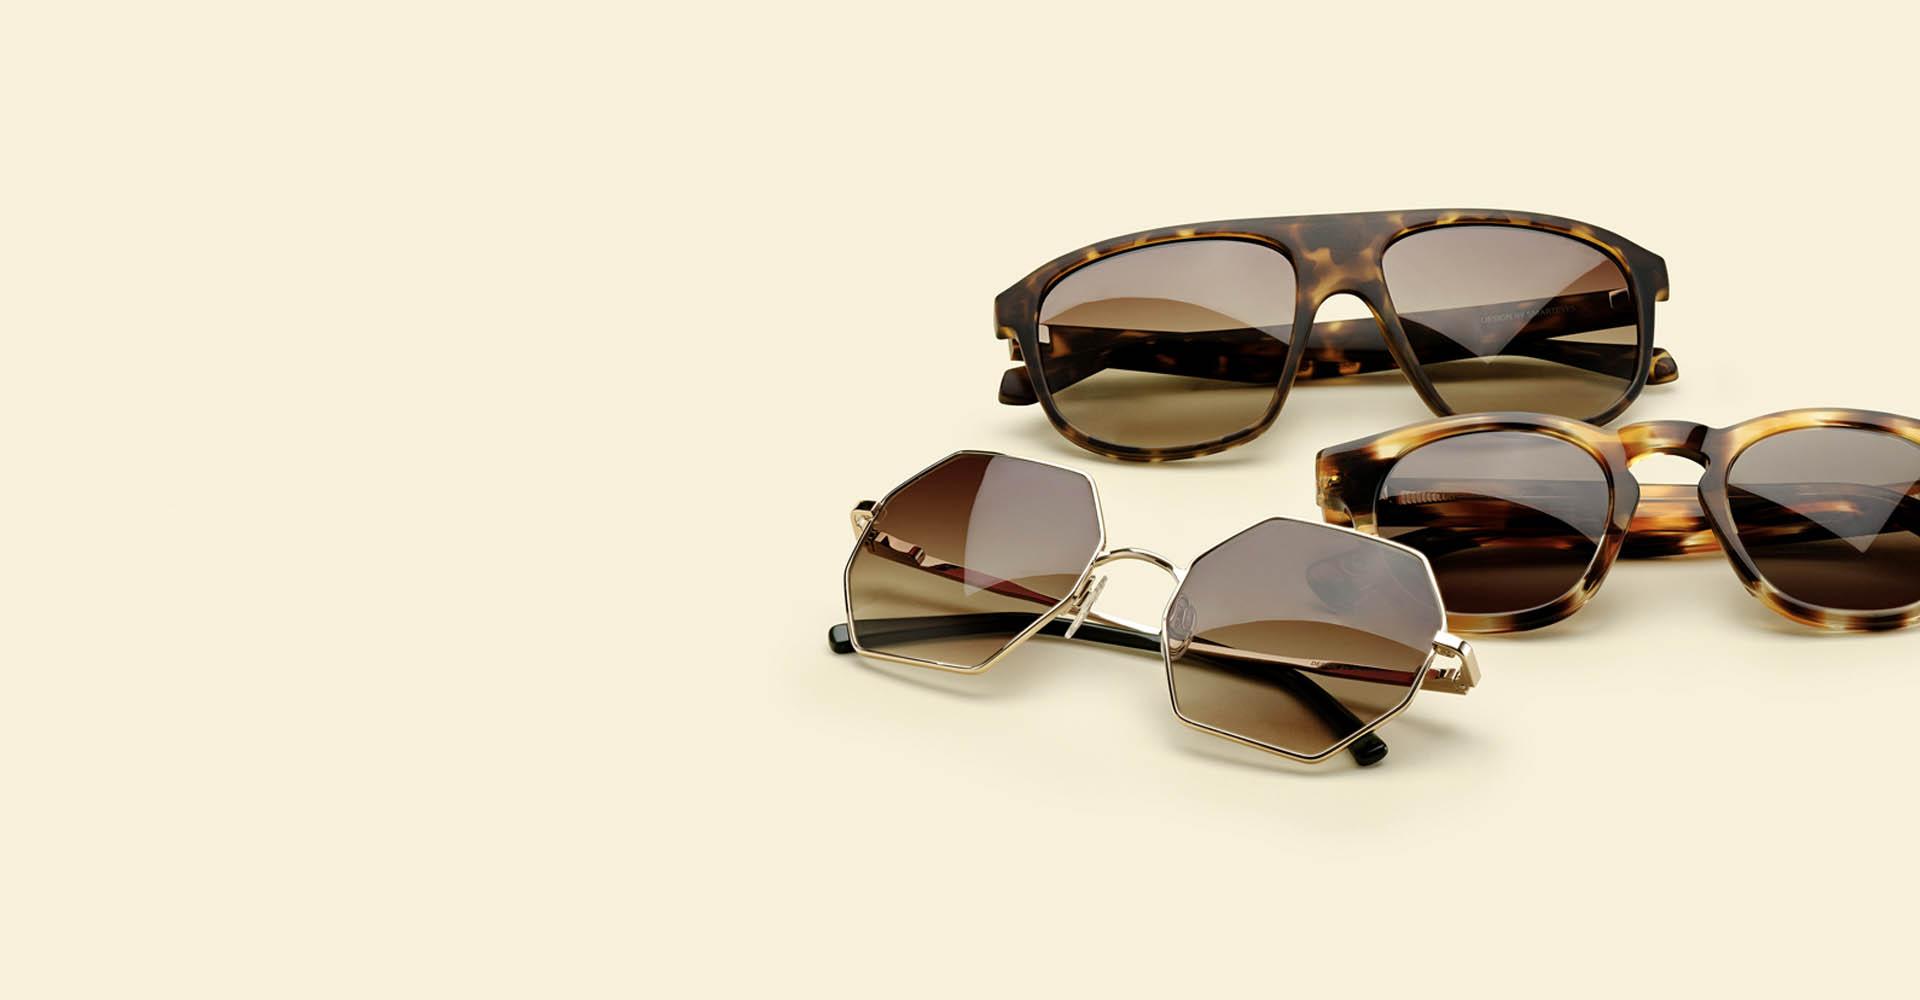 Solglasögon från Smarteyes 2021